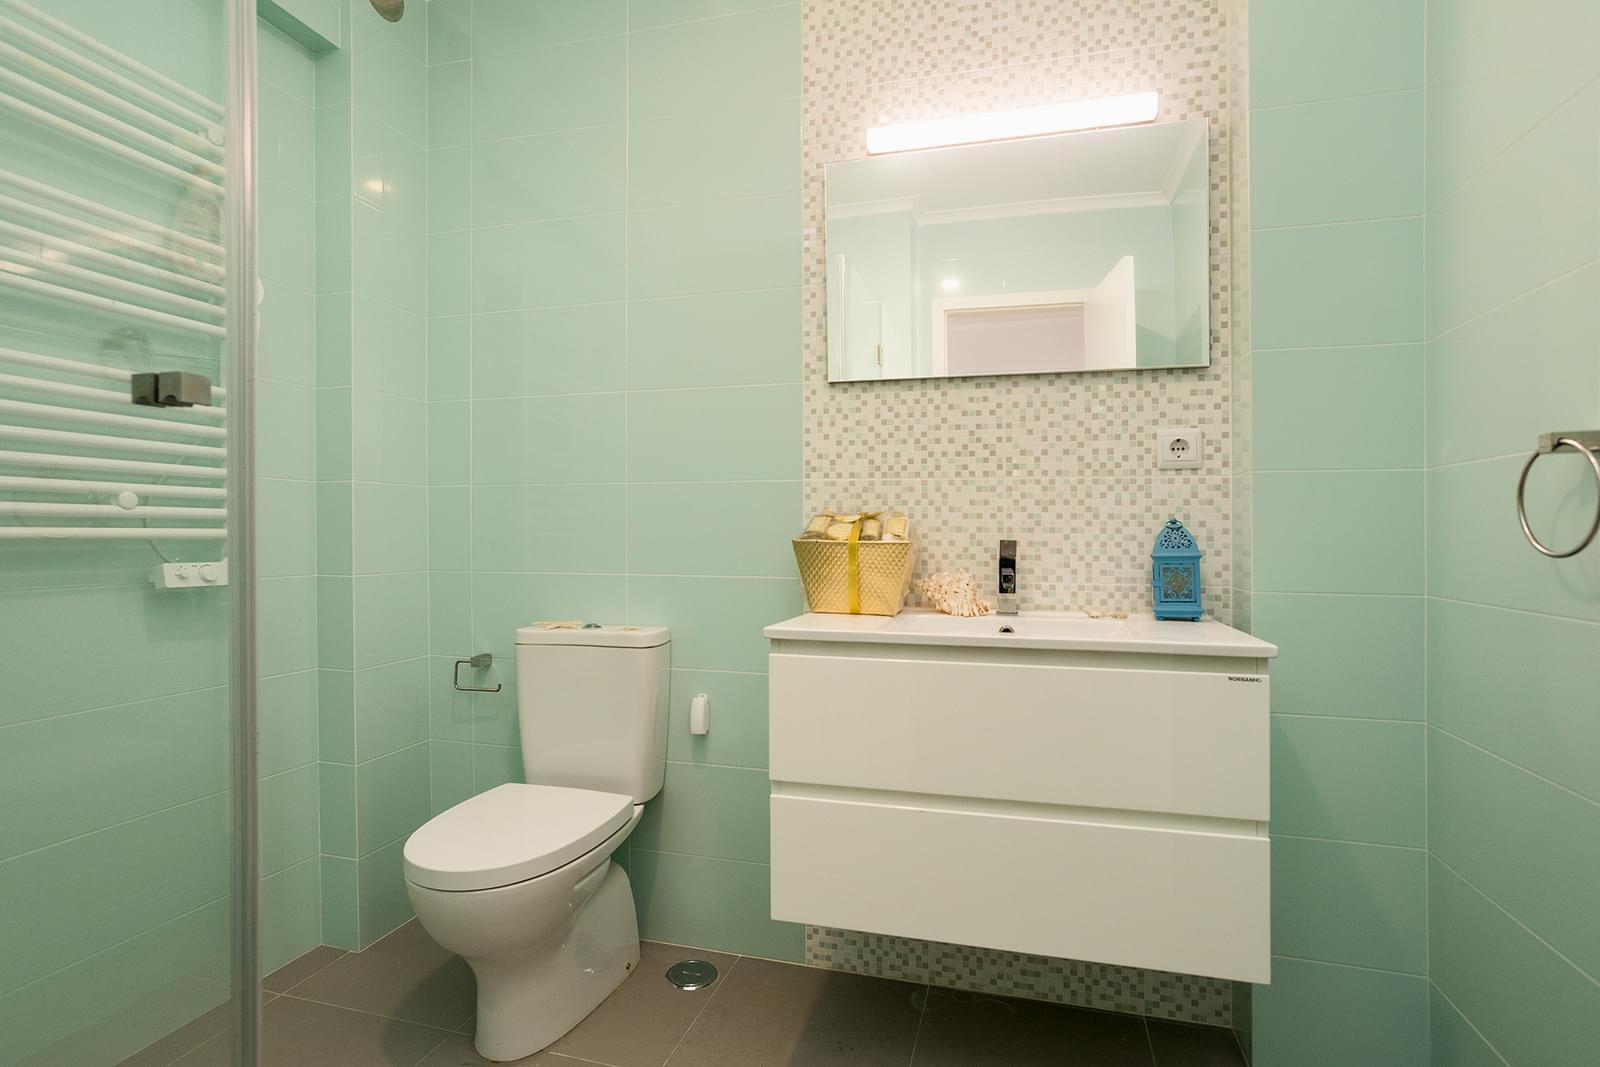 pf17340-apartamento-t3-lisboa-db6f7a49-b274-4115-9279-ff744b60a607